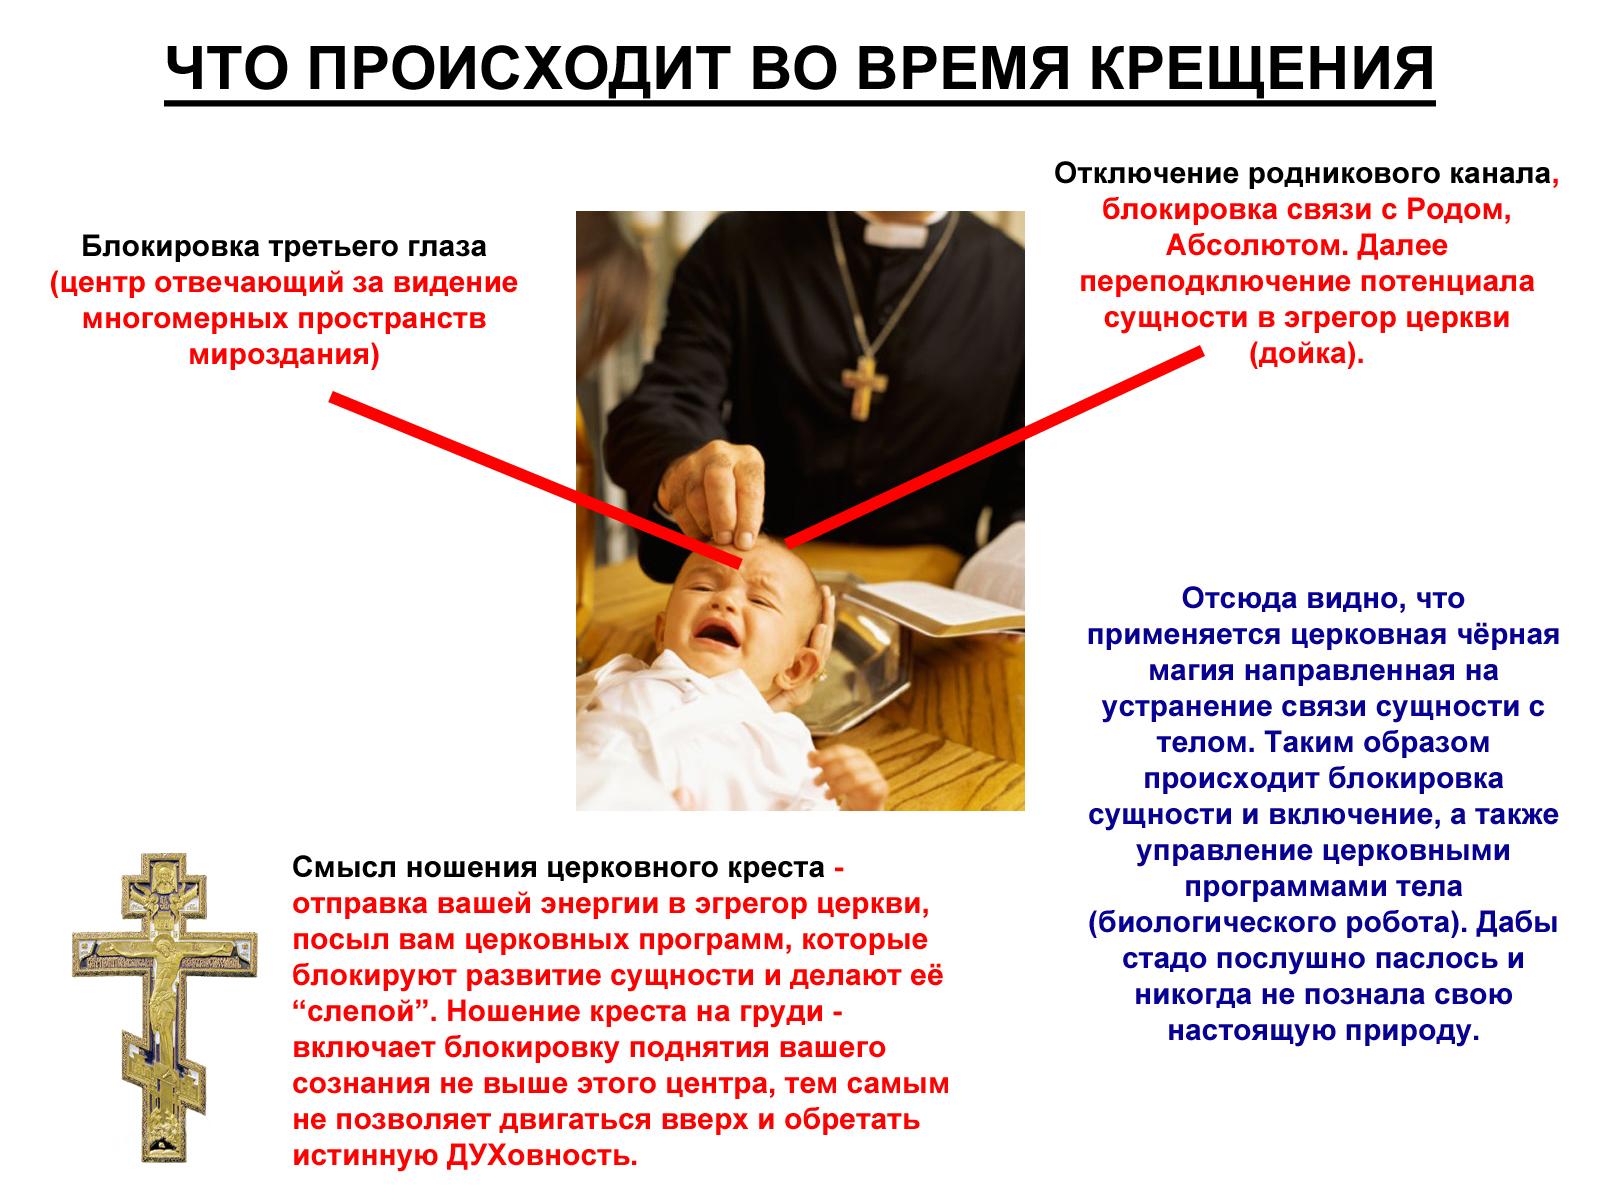 http://via-midgard.info//uploads/posts/2013-07/razoblachenie-cerkovnyx-ritualov-sut-cerkovnoj_9.jpg